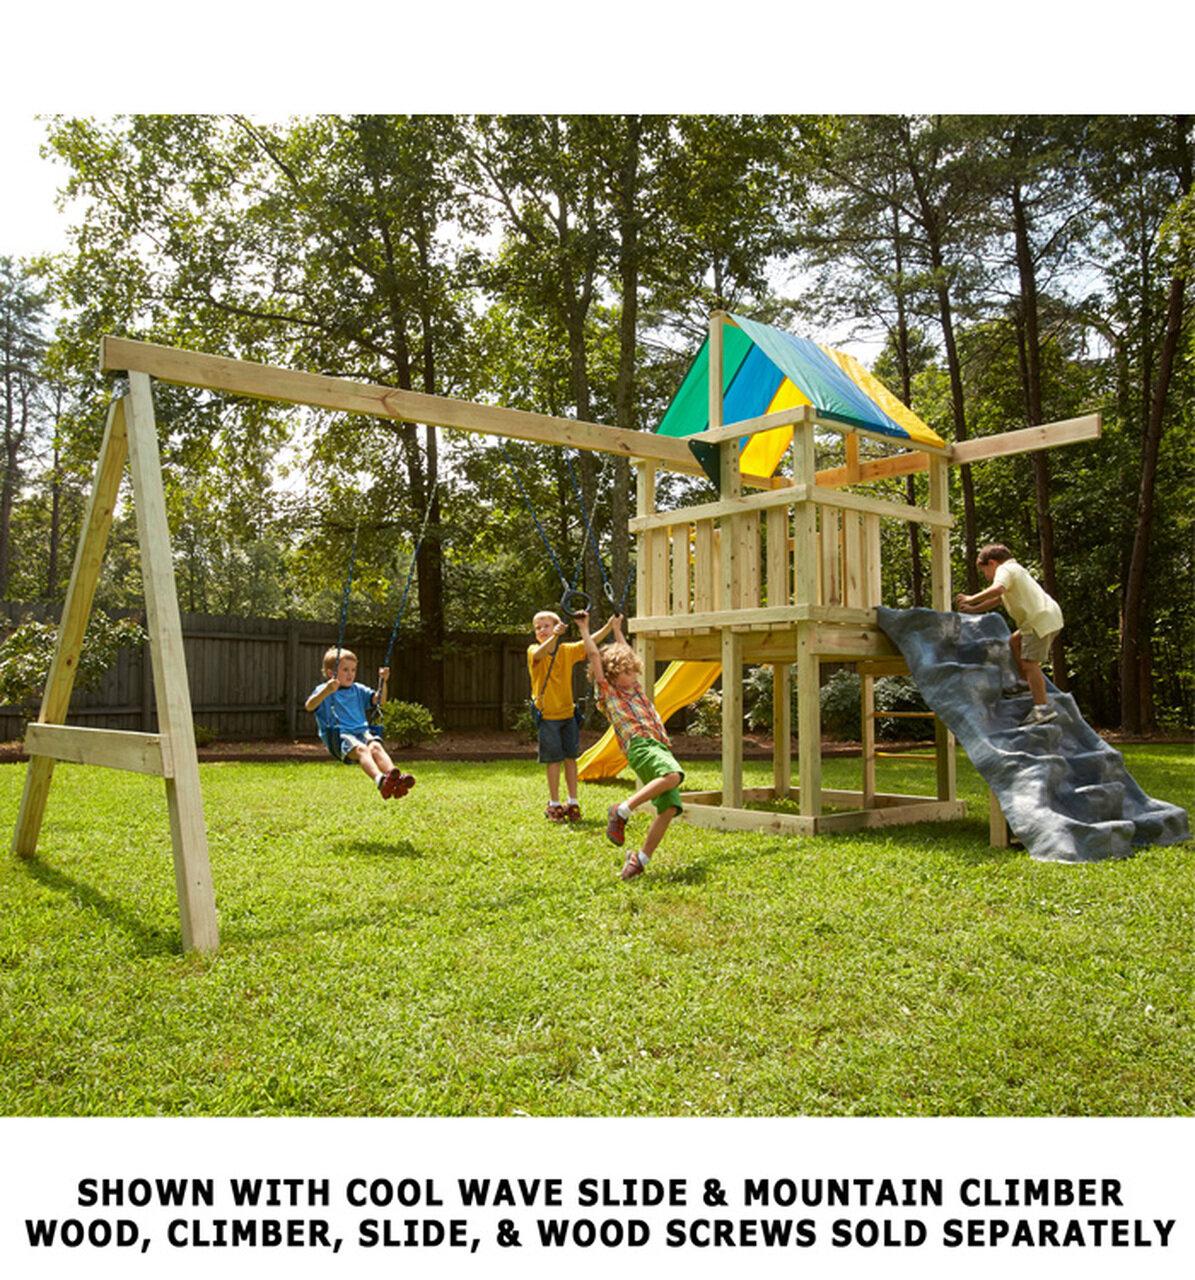 Wood Swing Set Kit Made in USA Bay Swings Swing Set Brackets DIY Swing Set Hardware Kit Swing Frame